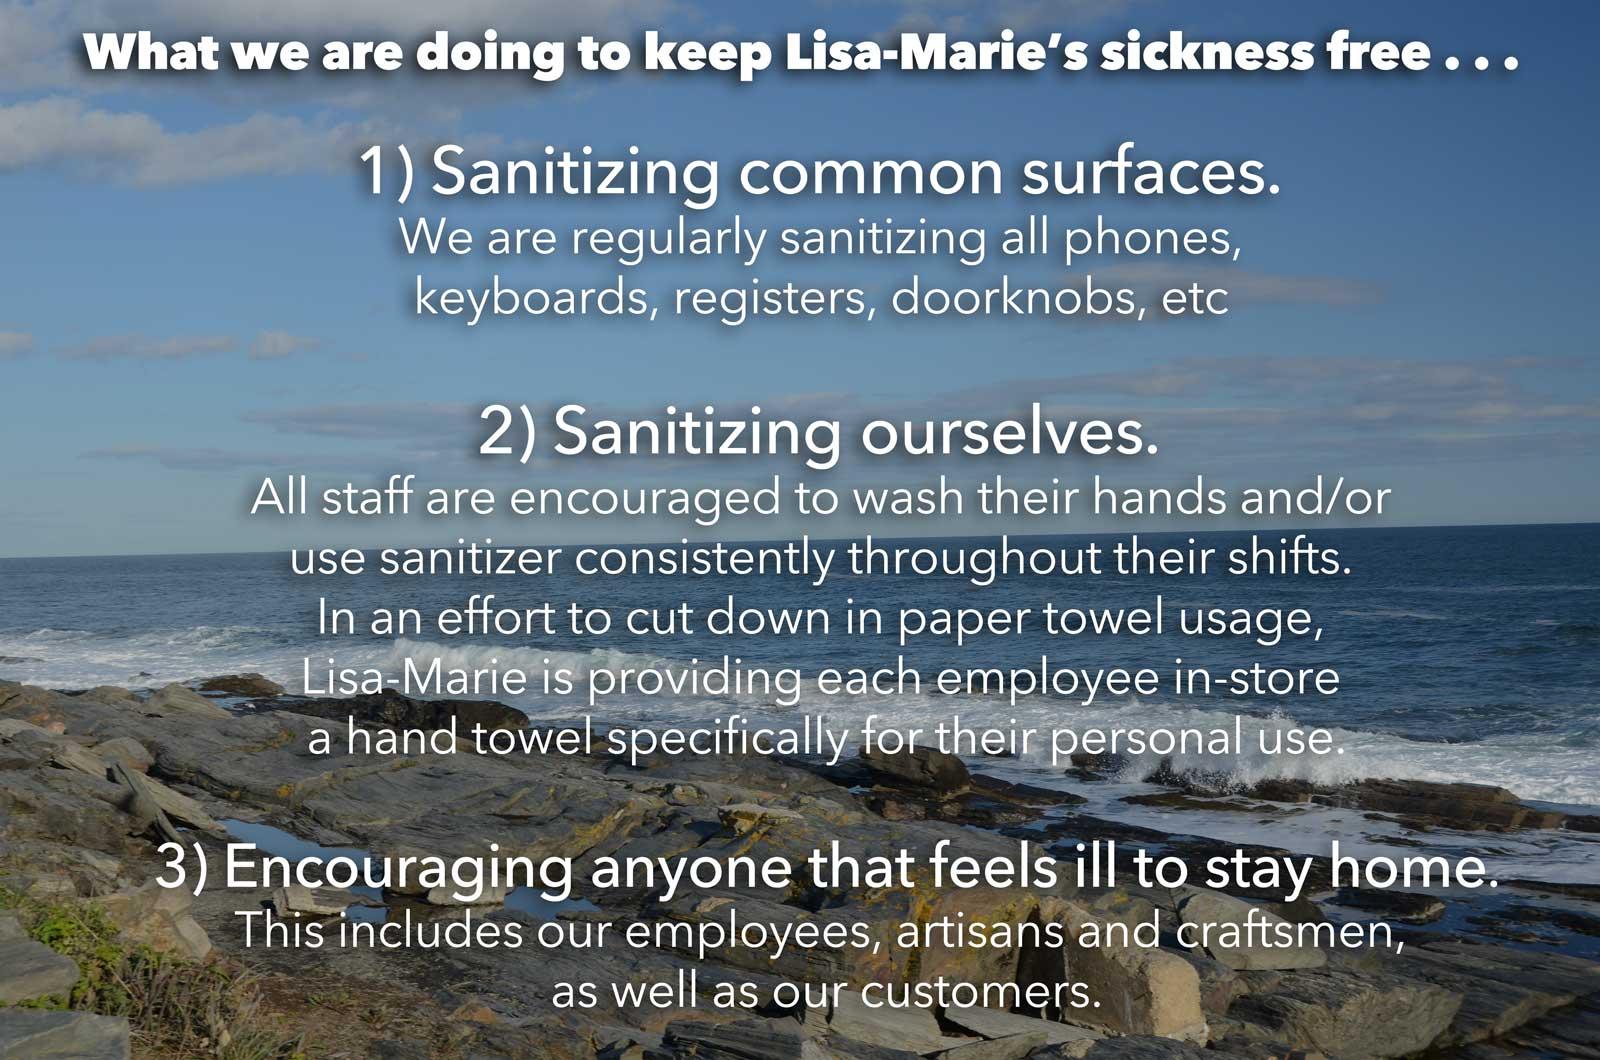 Keepin' it clean at Lisa-Marie's